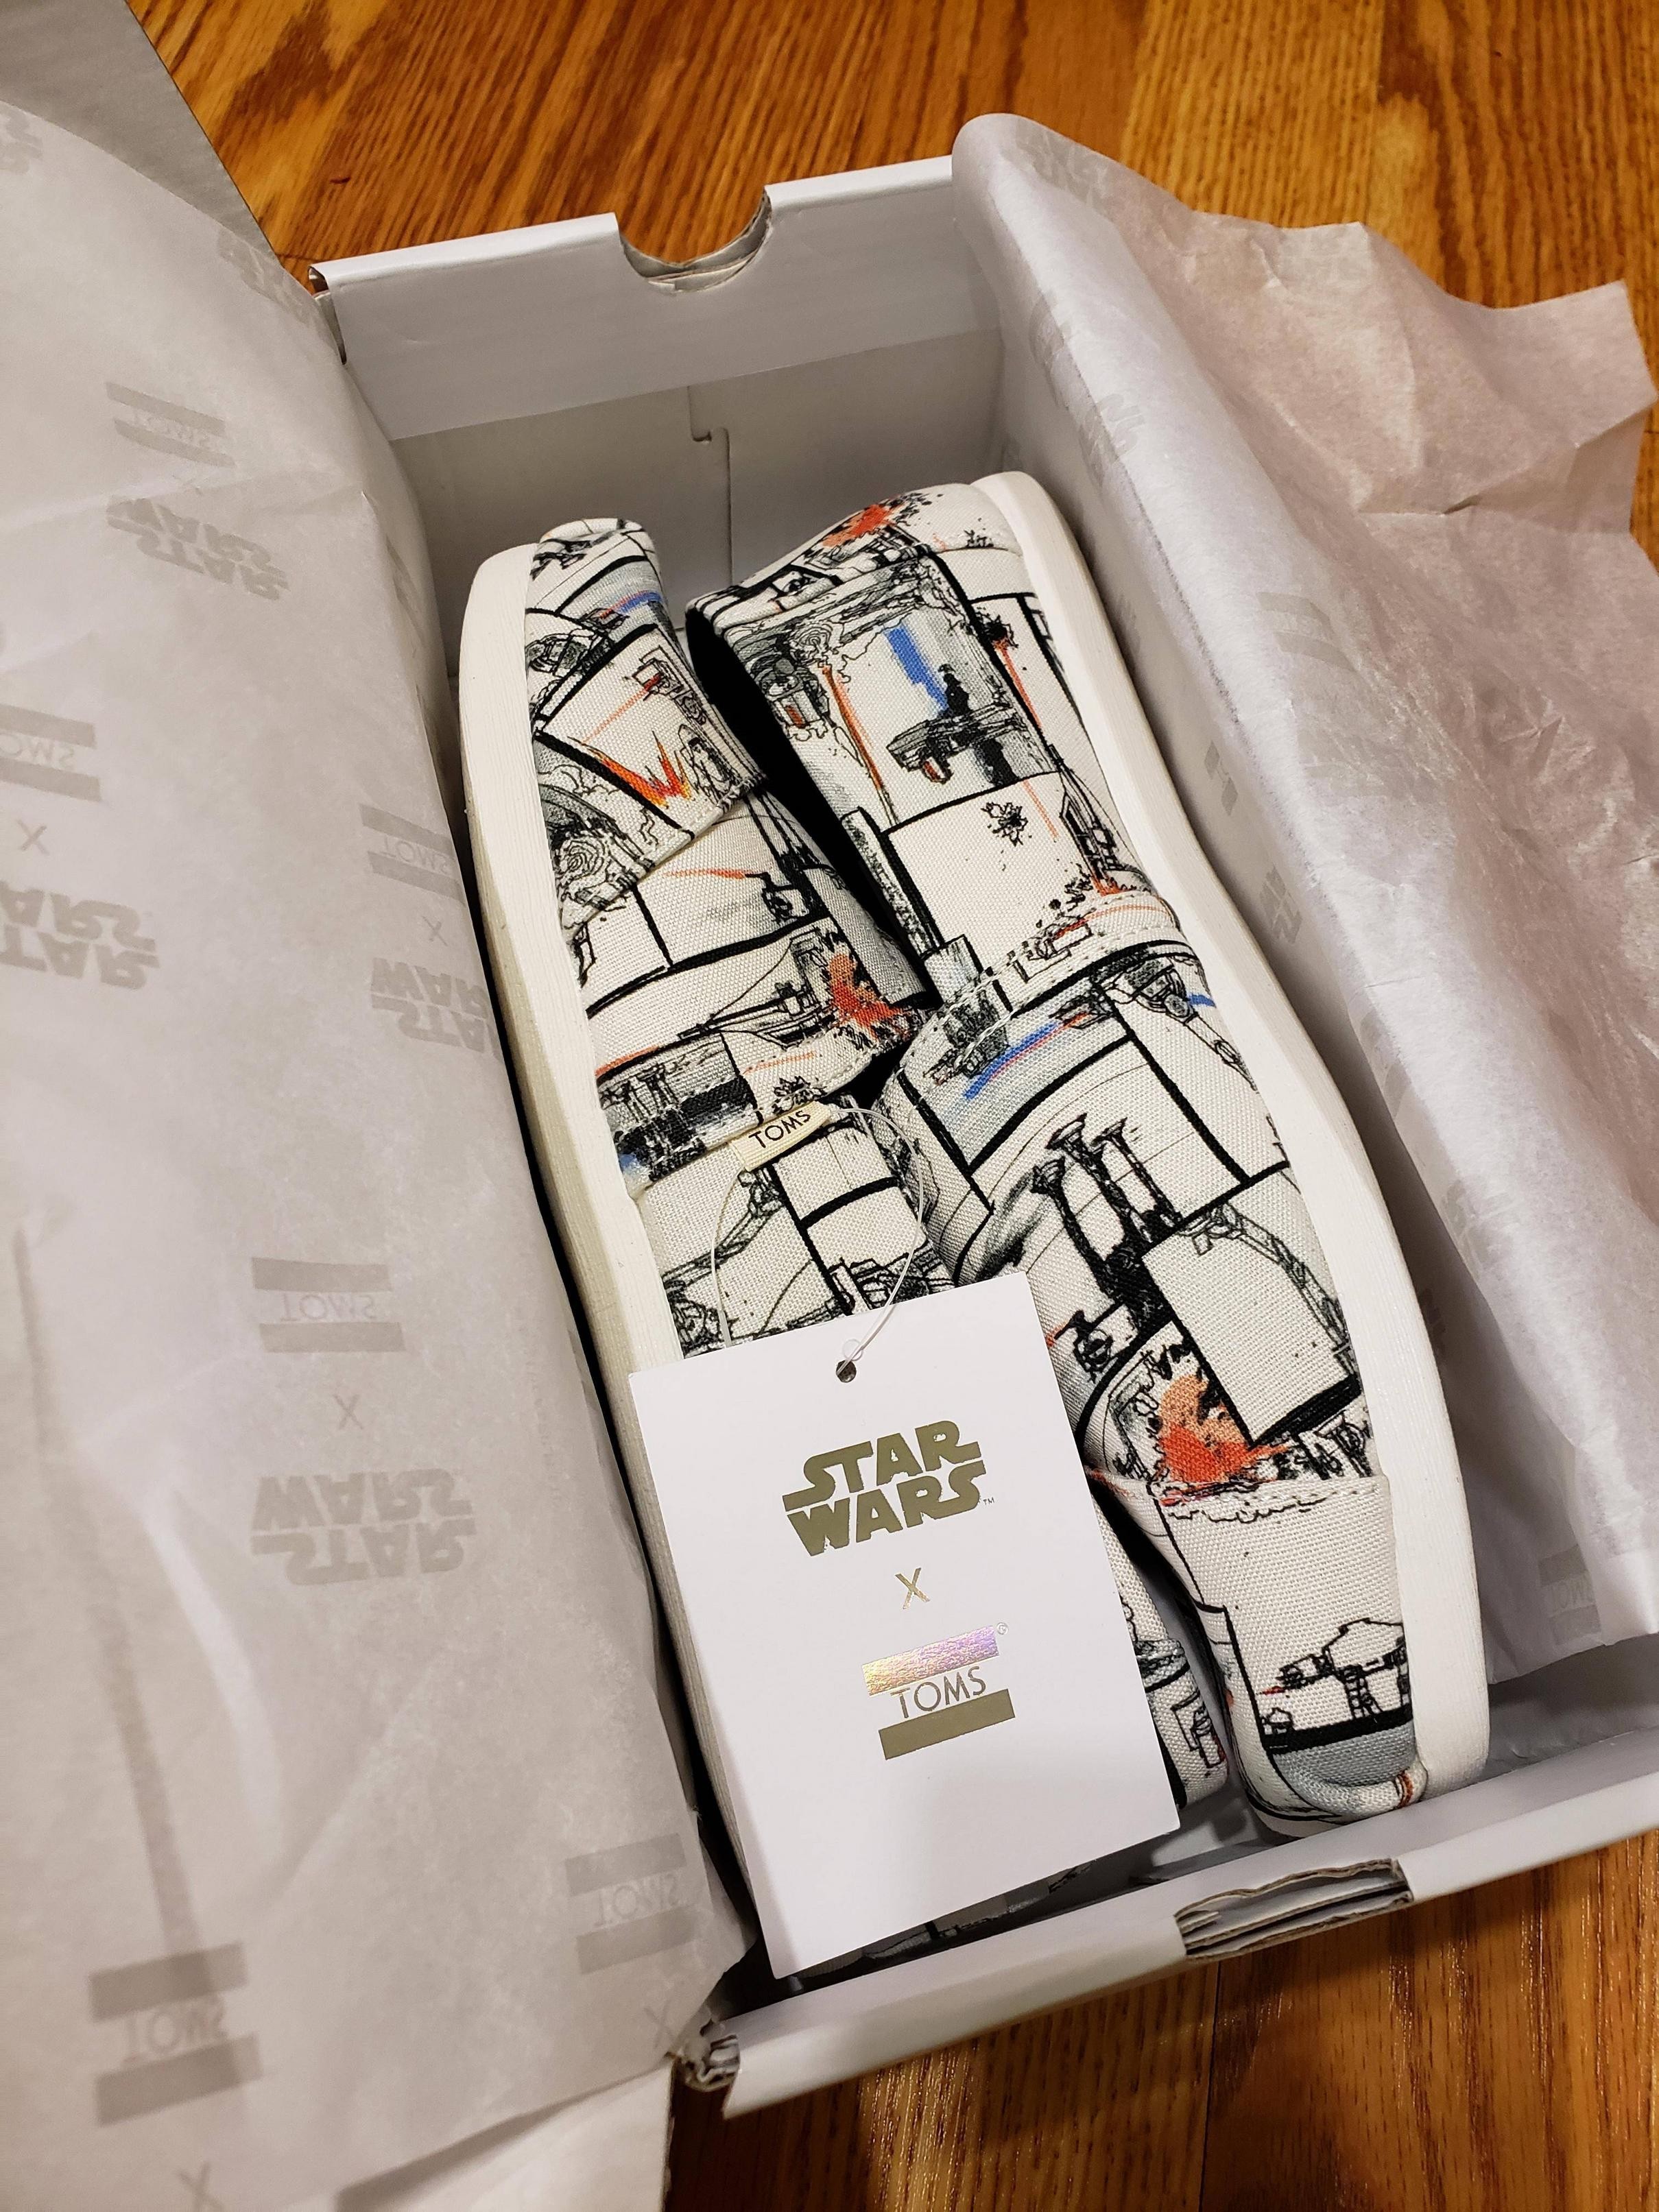 Toms... just got my Toms Star Wars. So happy!